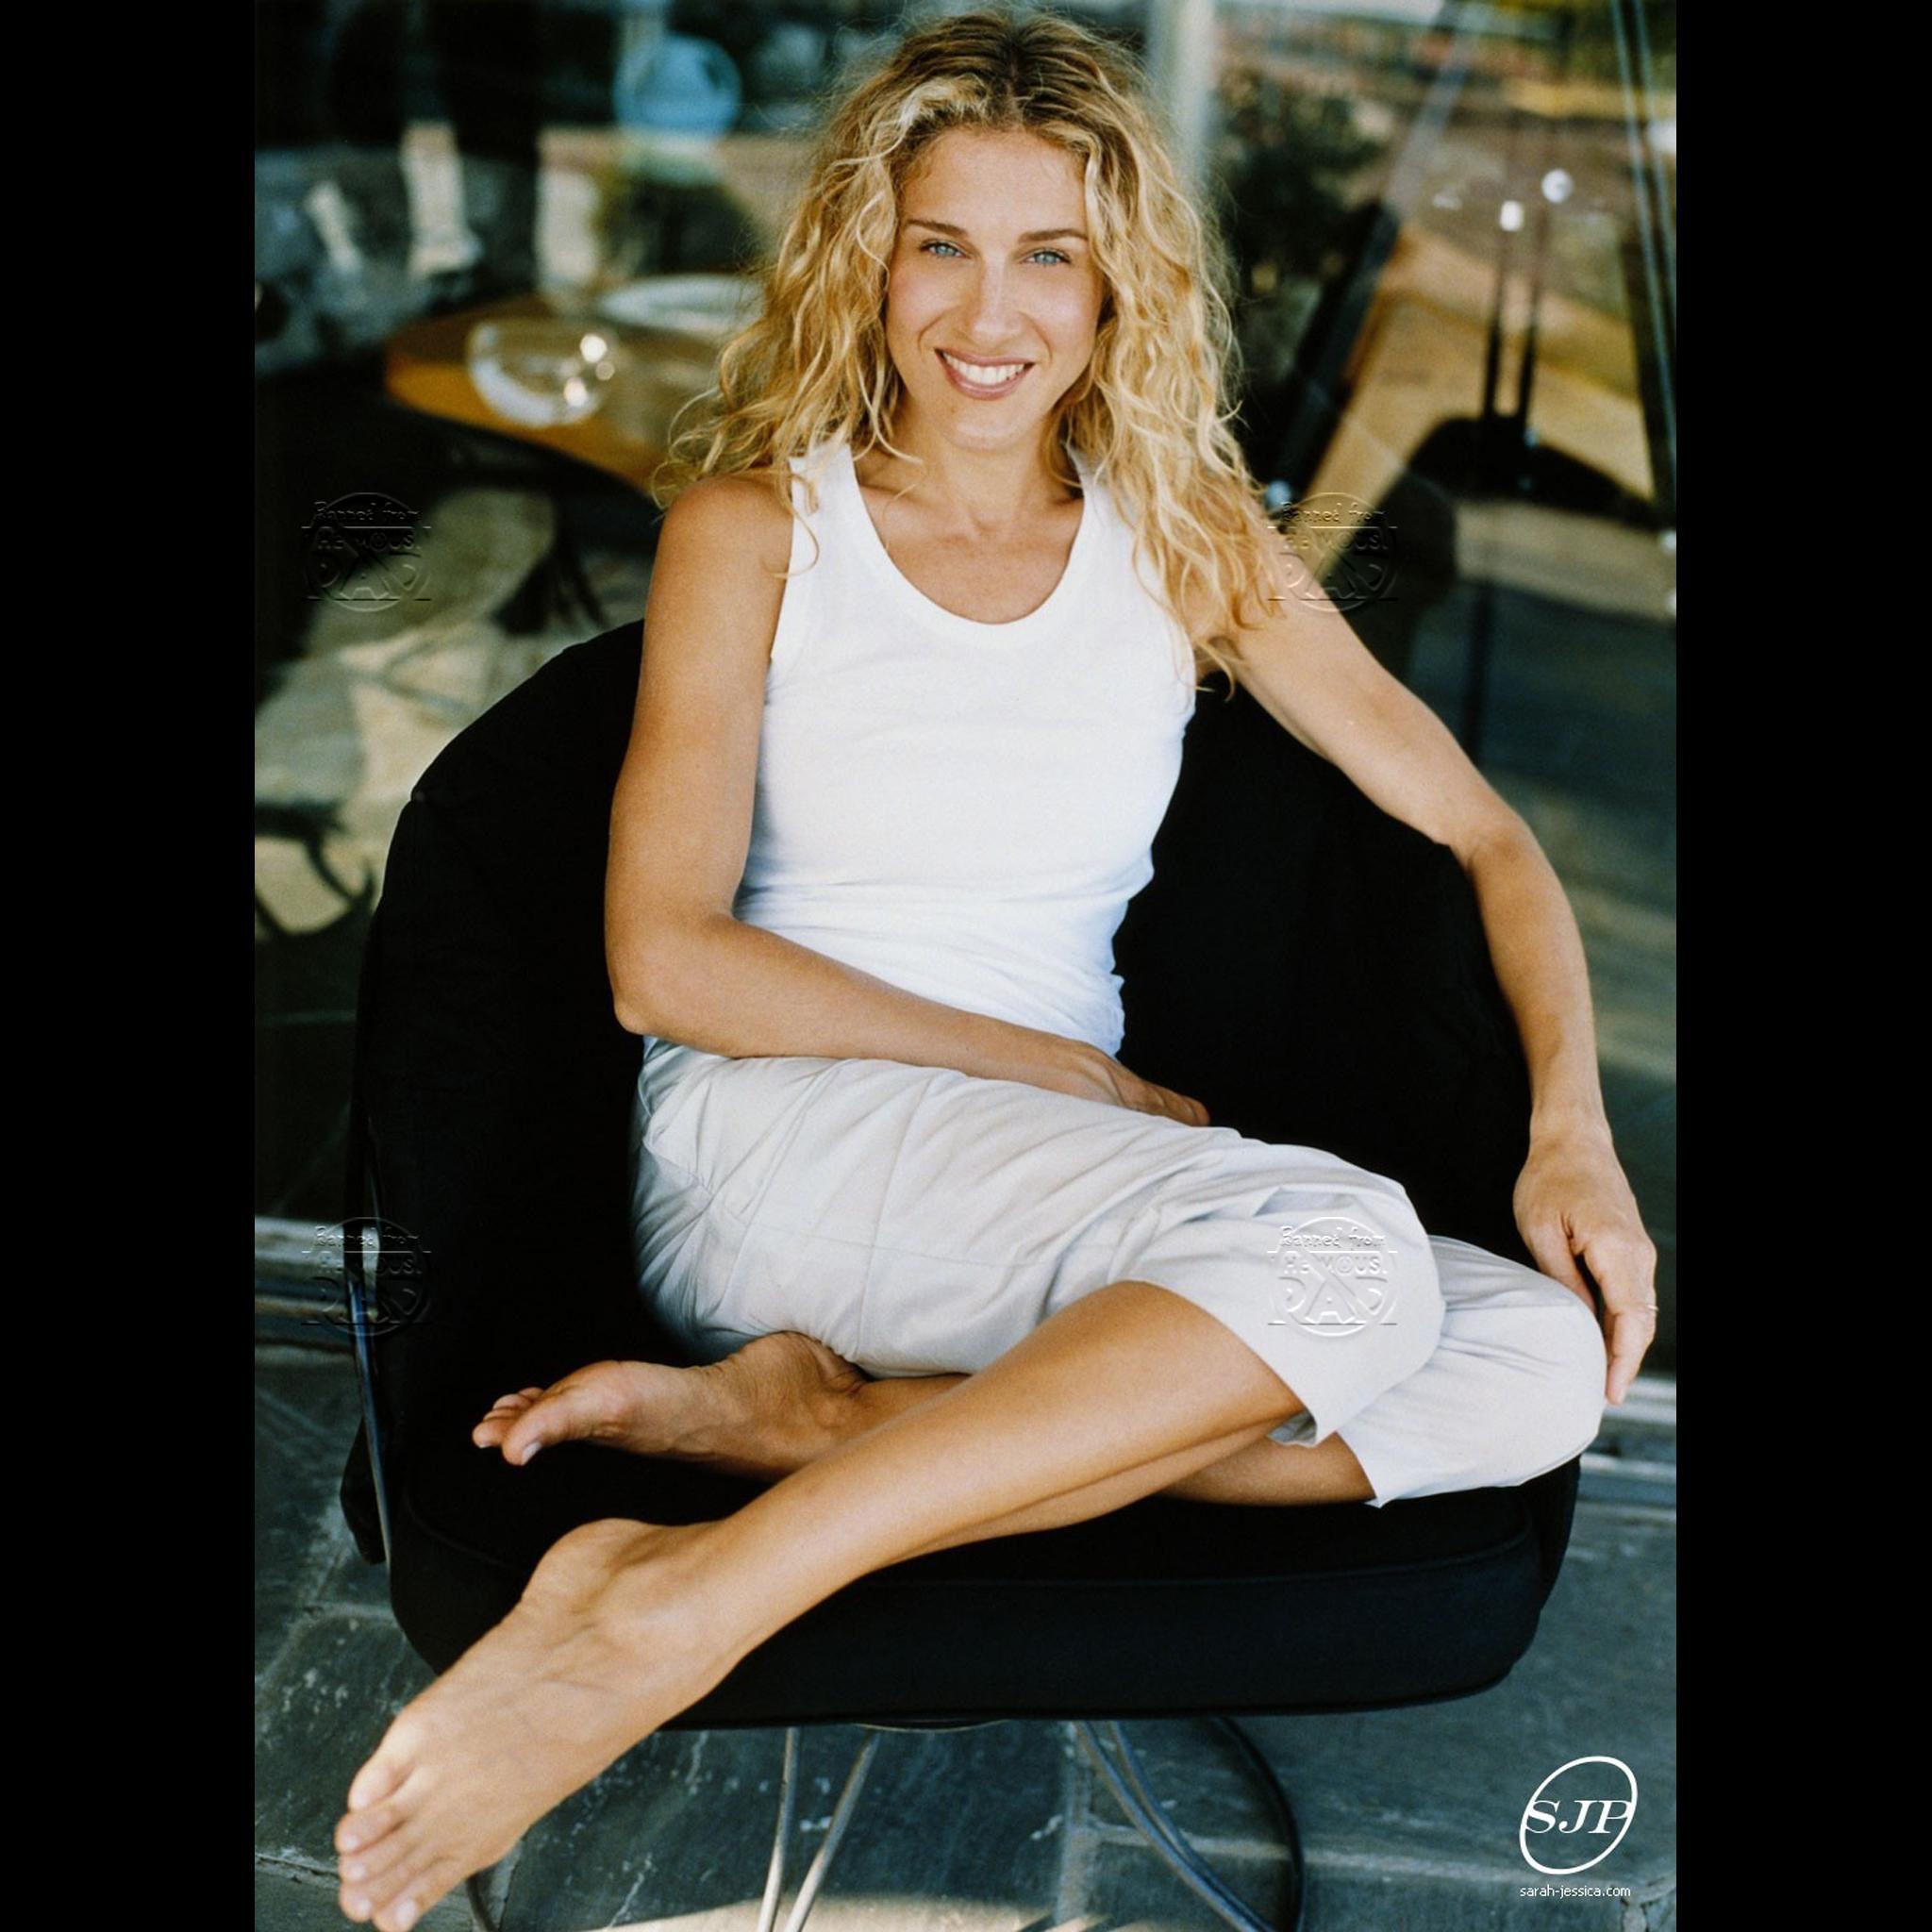 blondes legs women stockings high heels sarah jessica